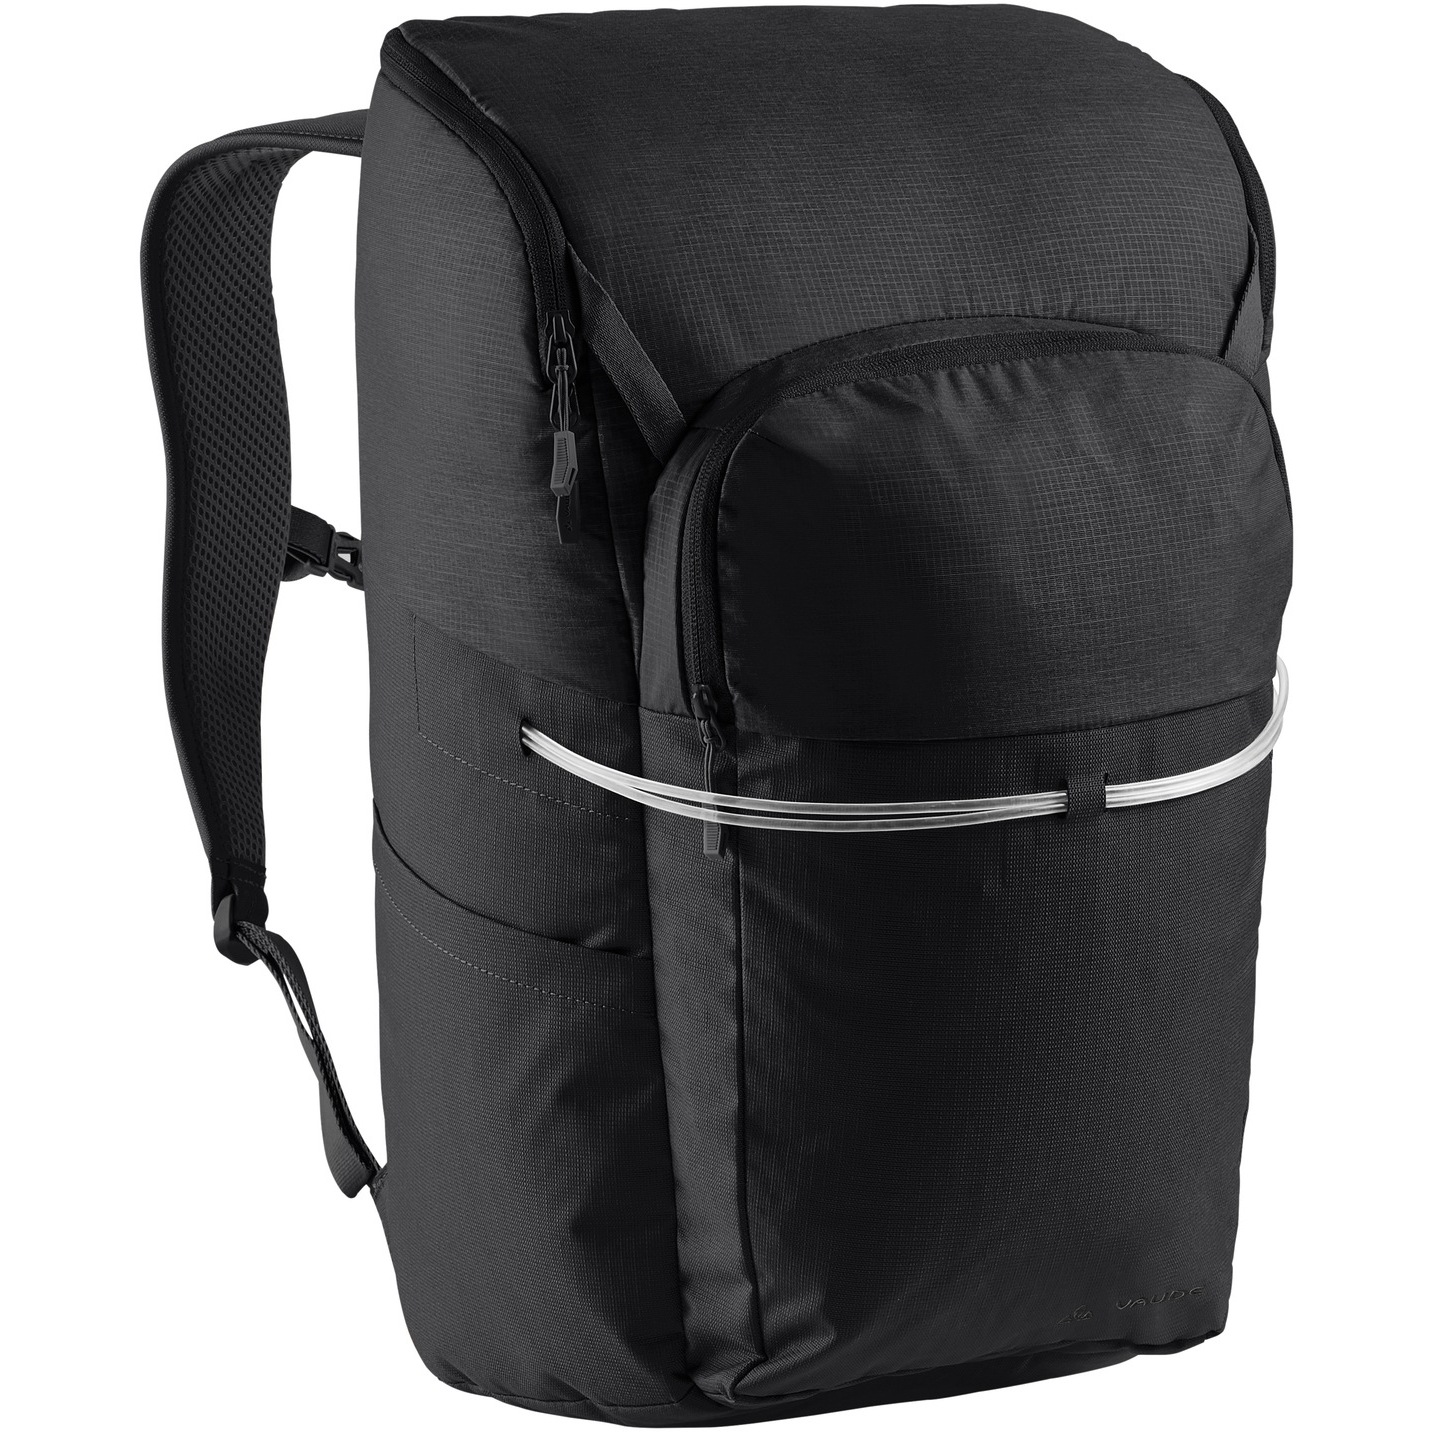 Image of Vaude Albali Backpack - black